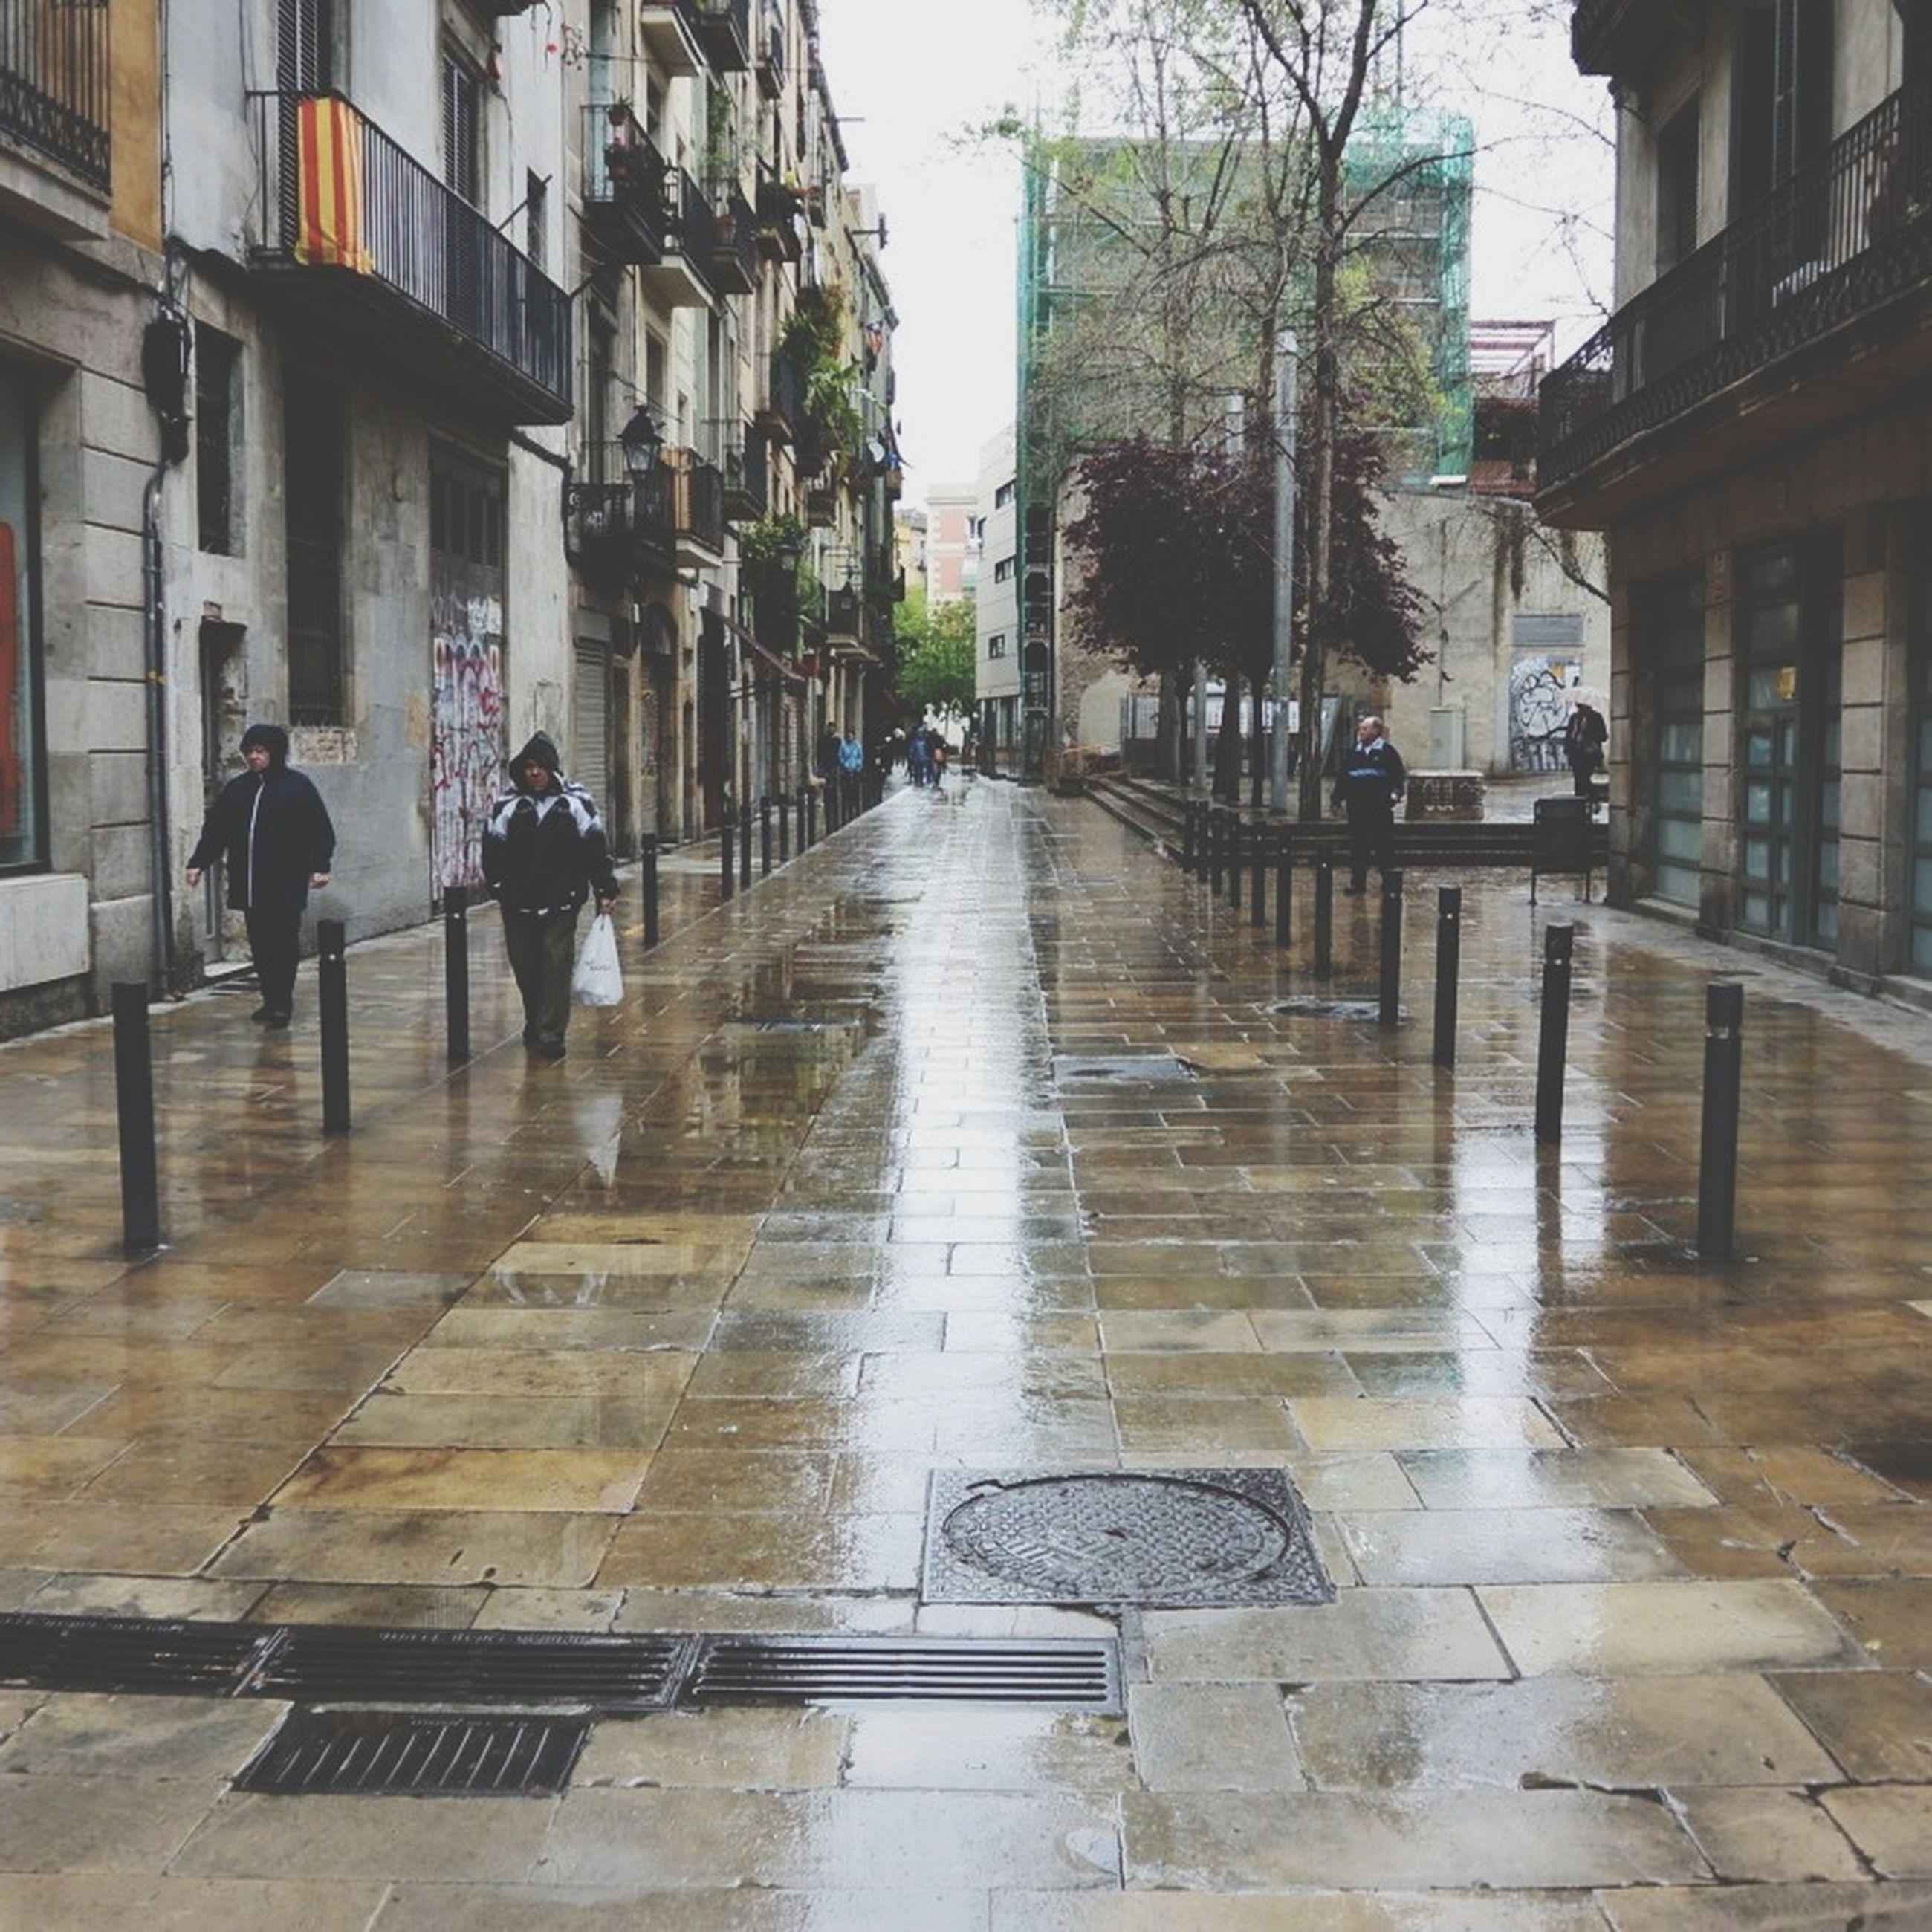 building exterior, architecture, built structure, street, city, wet, walking, city life, rain, transportation, men, incidental people, building, the way forward, reflection, sidewalk, person, city street, lifestyles